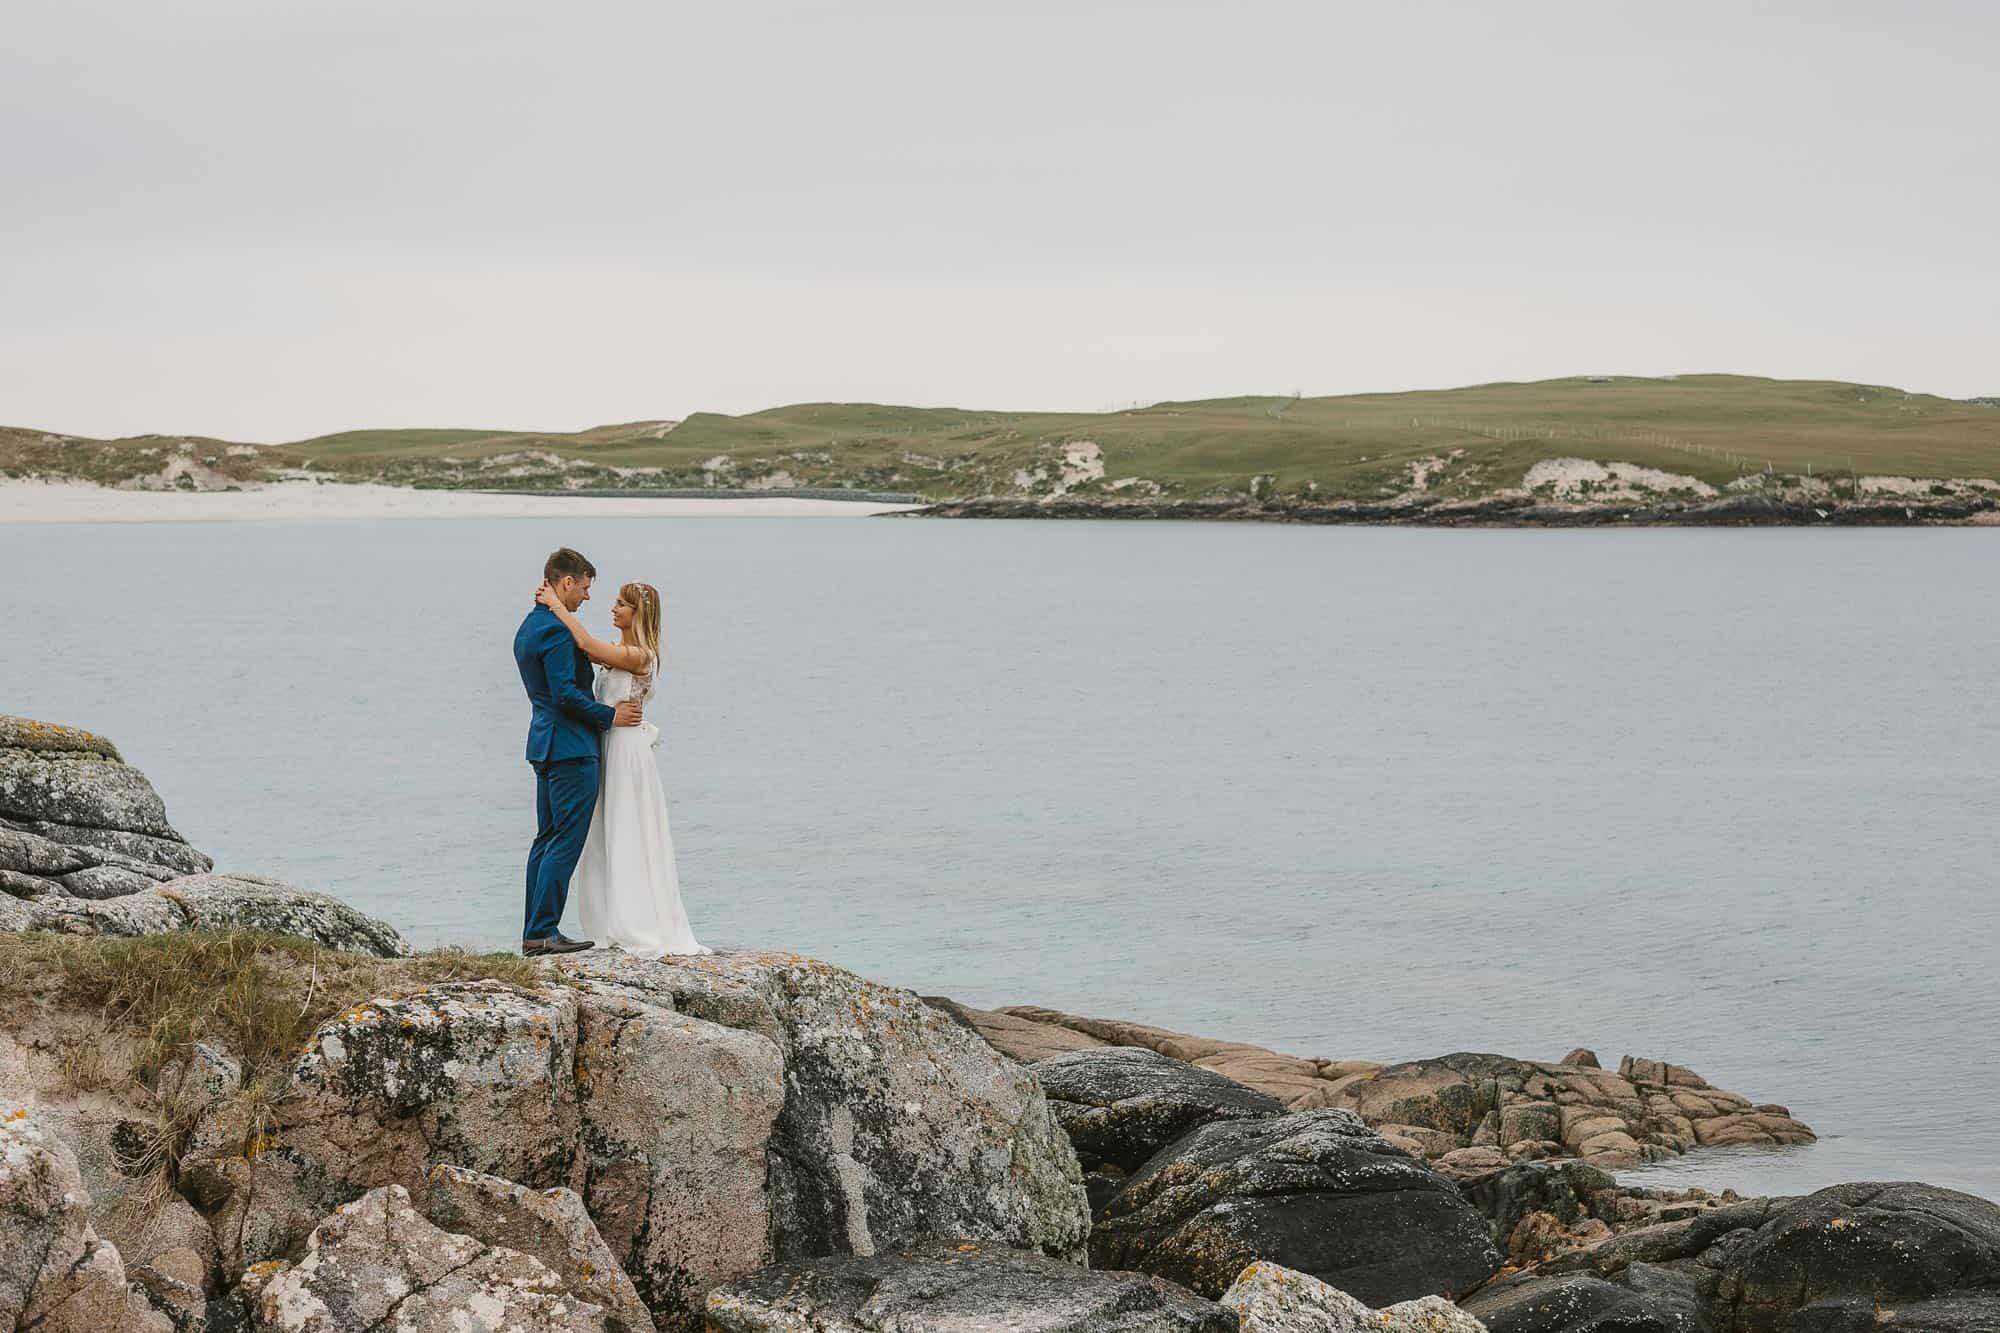 Elopement Ireland Connemara Beach Shoot of couple on rocks